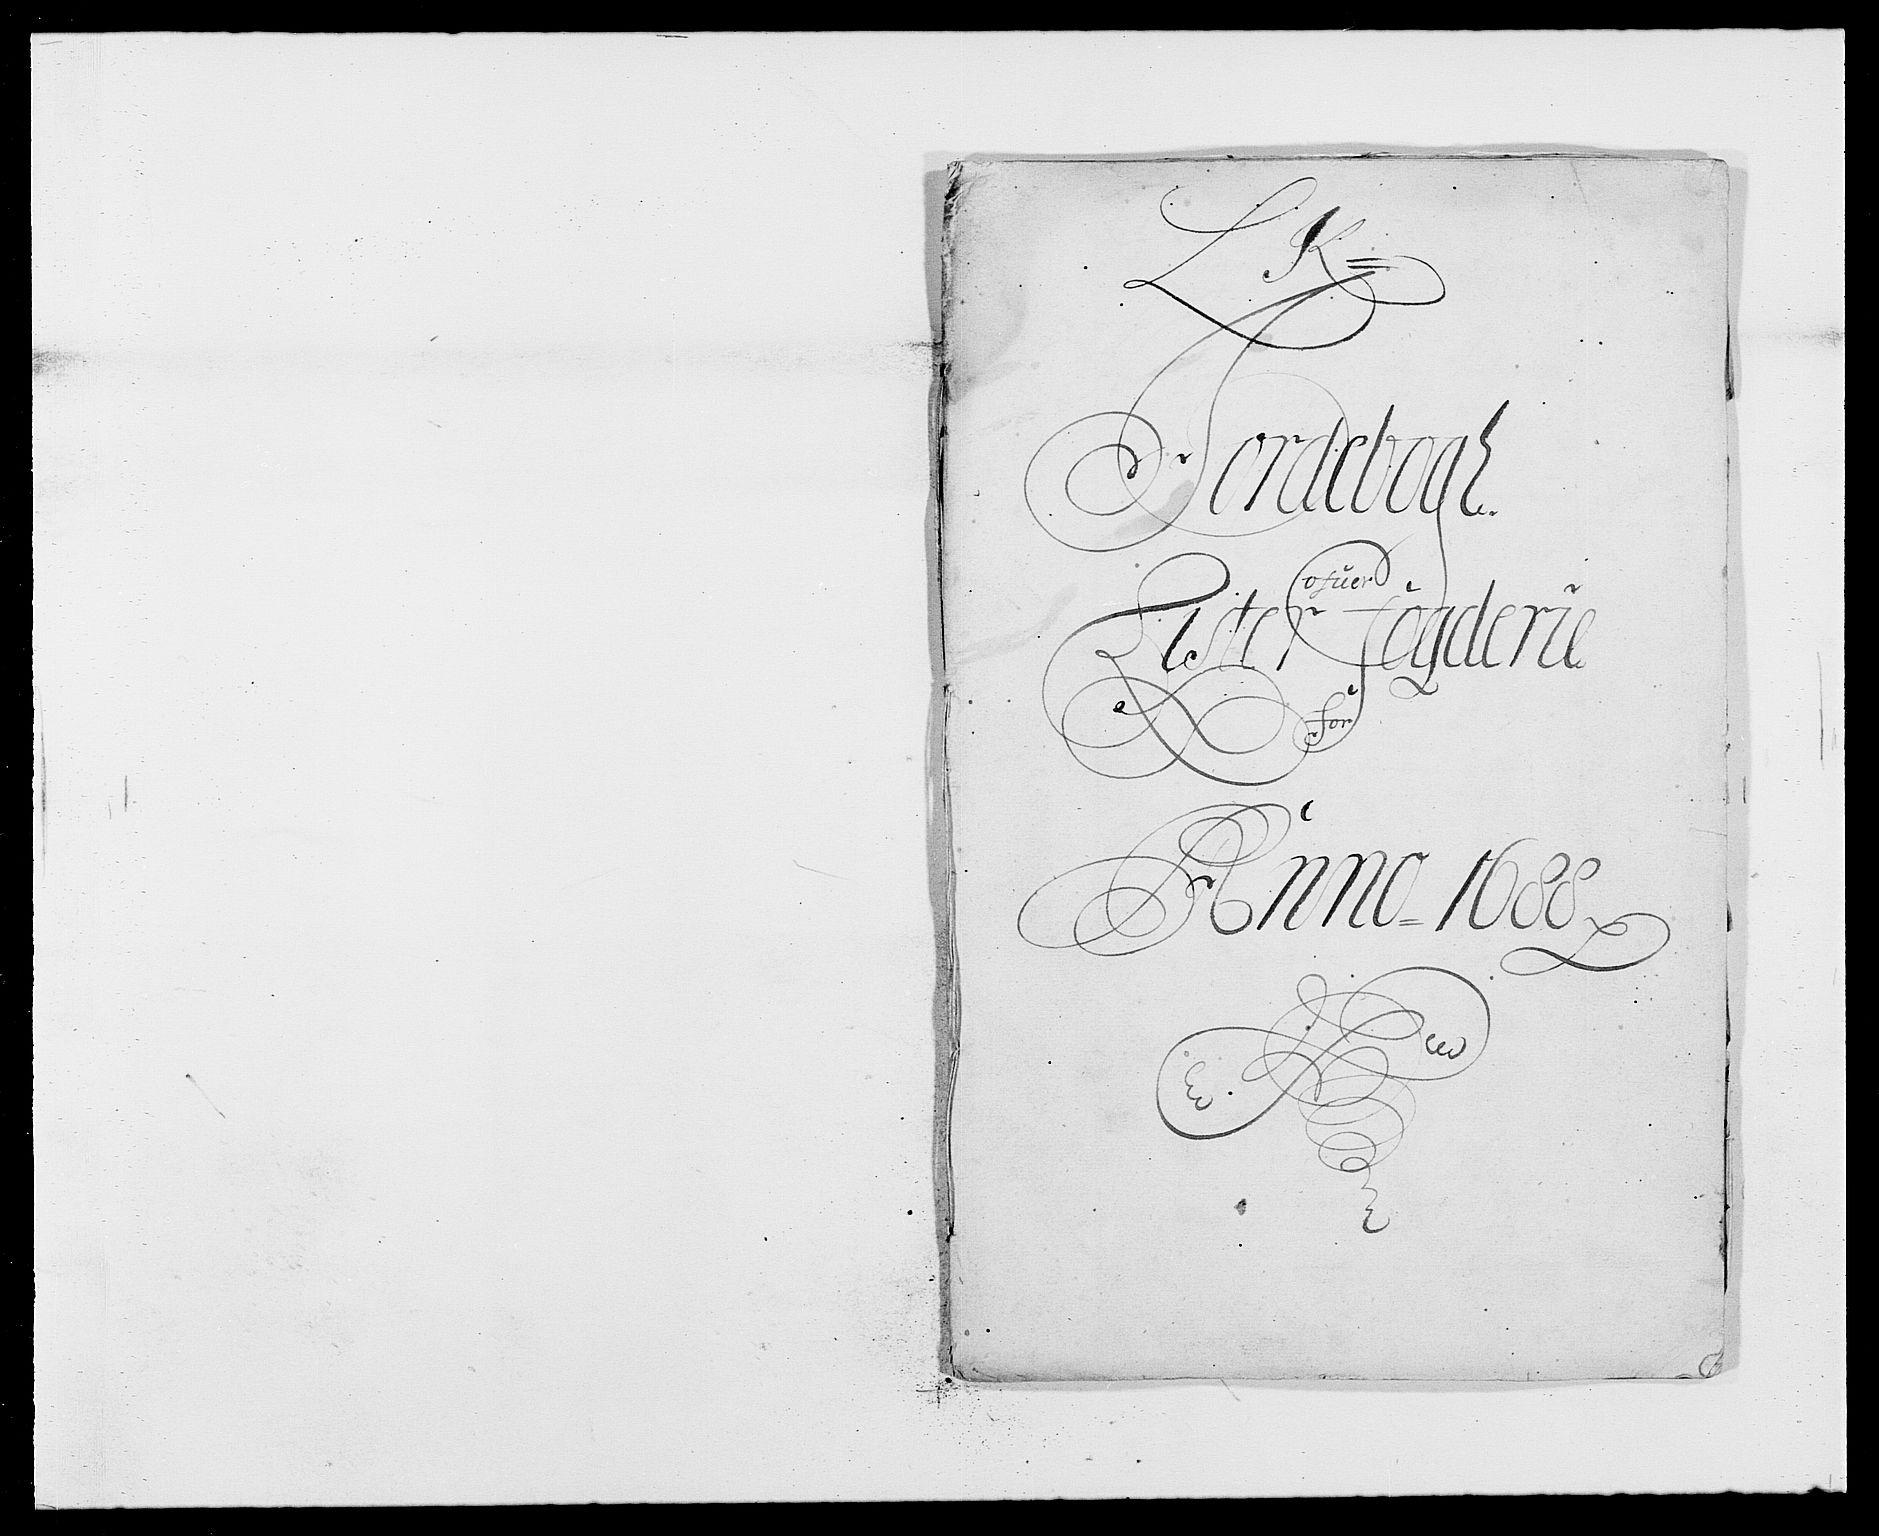 RA, Rentekammeret inntil 1814, Reviderte regnskaper, Fogderegnskap, R41/L2534: Fogderegnskap Lista, 1686-1688, s. 175